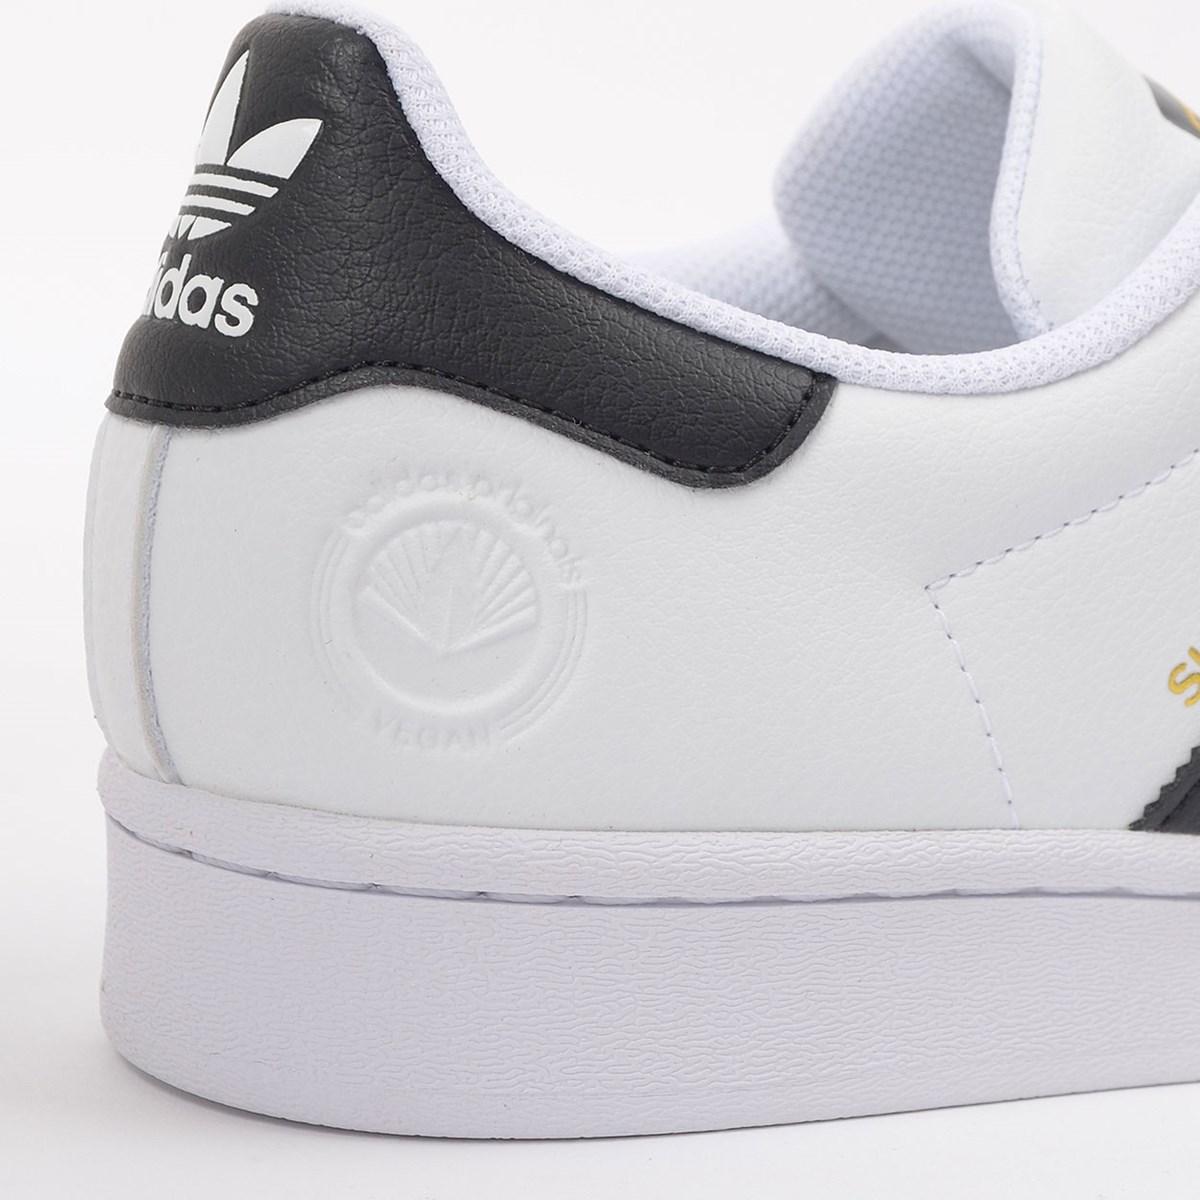 Tênis adidas Superstar Vegan Ftwr White Core Black FW2295